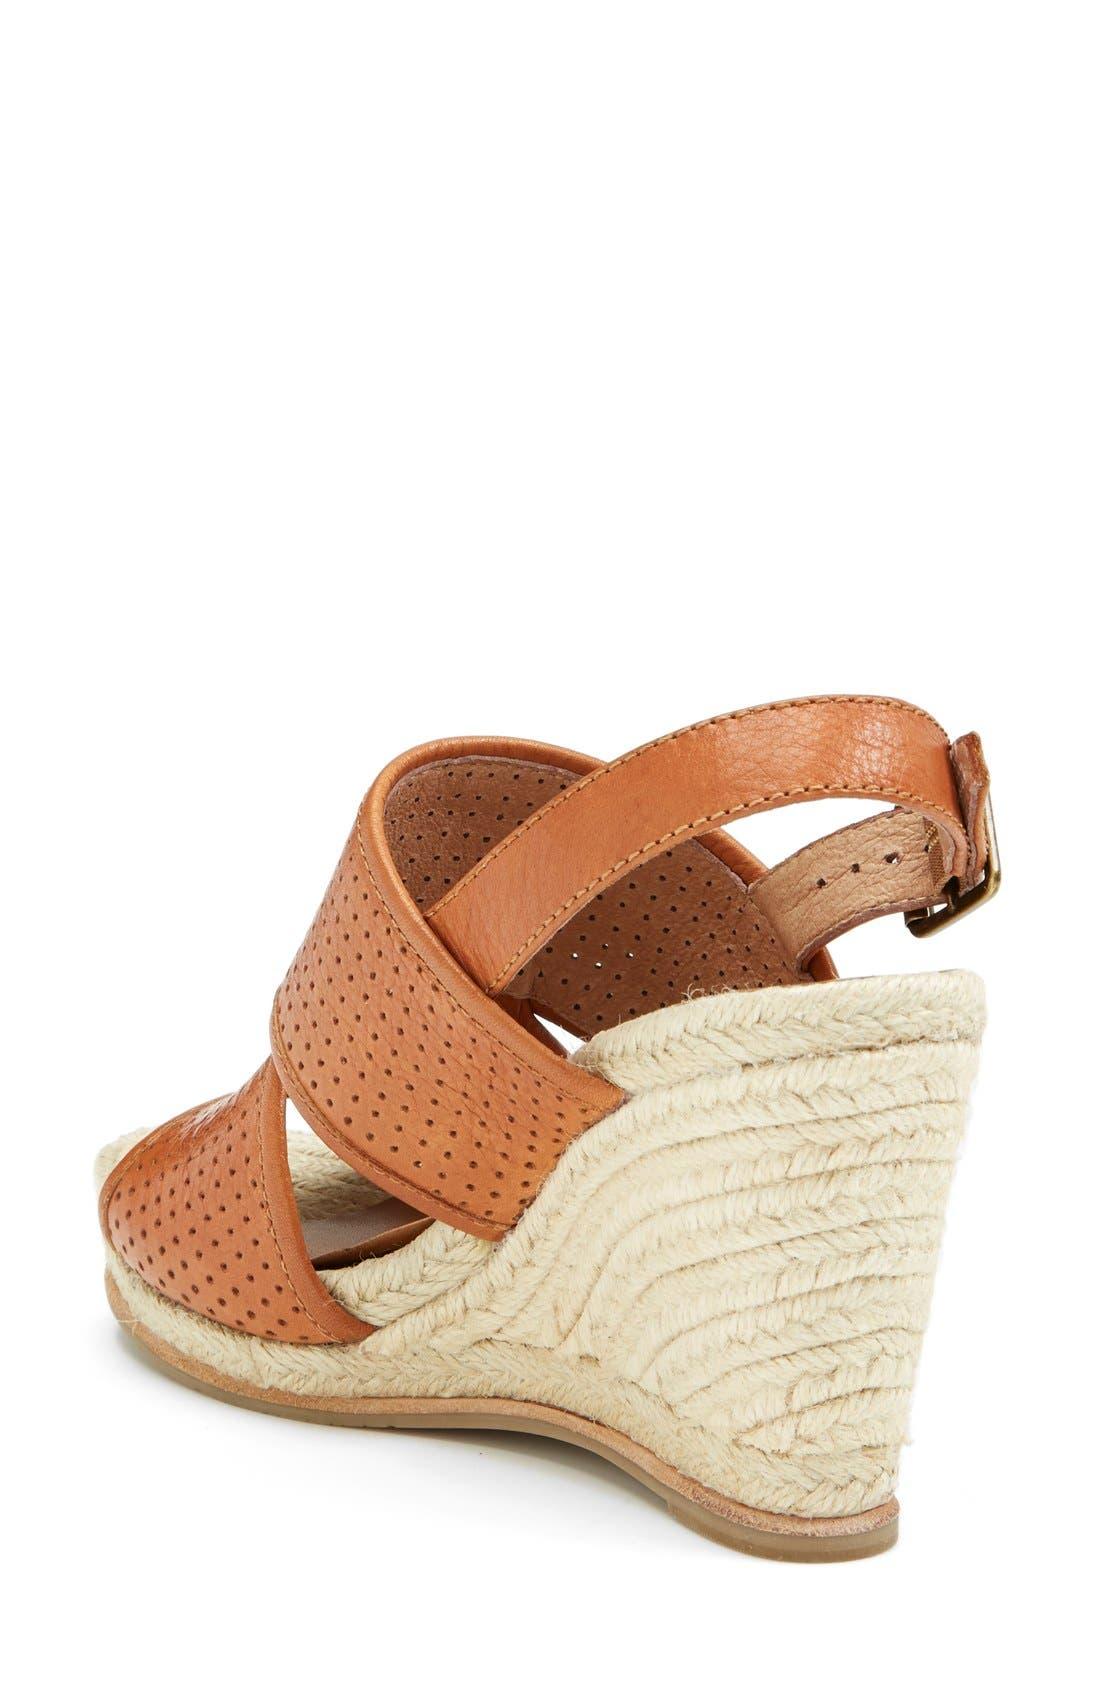 Alternate Image 2  - Biala 'Joyce' Perforated Espadrille Wedge Sandal (Women)